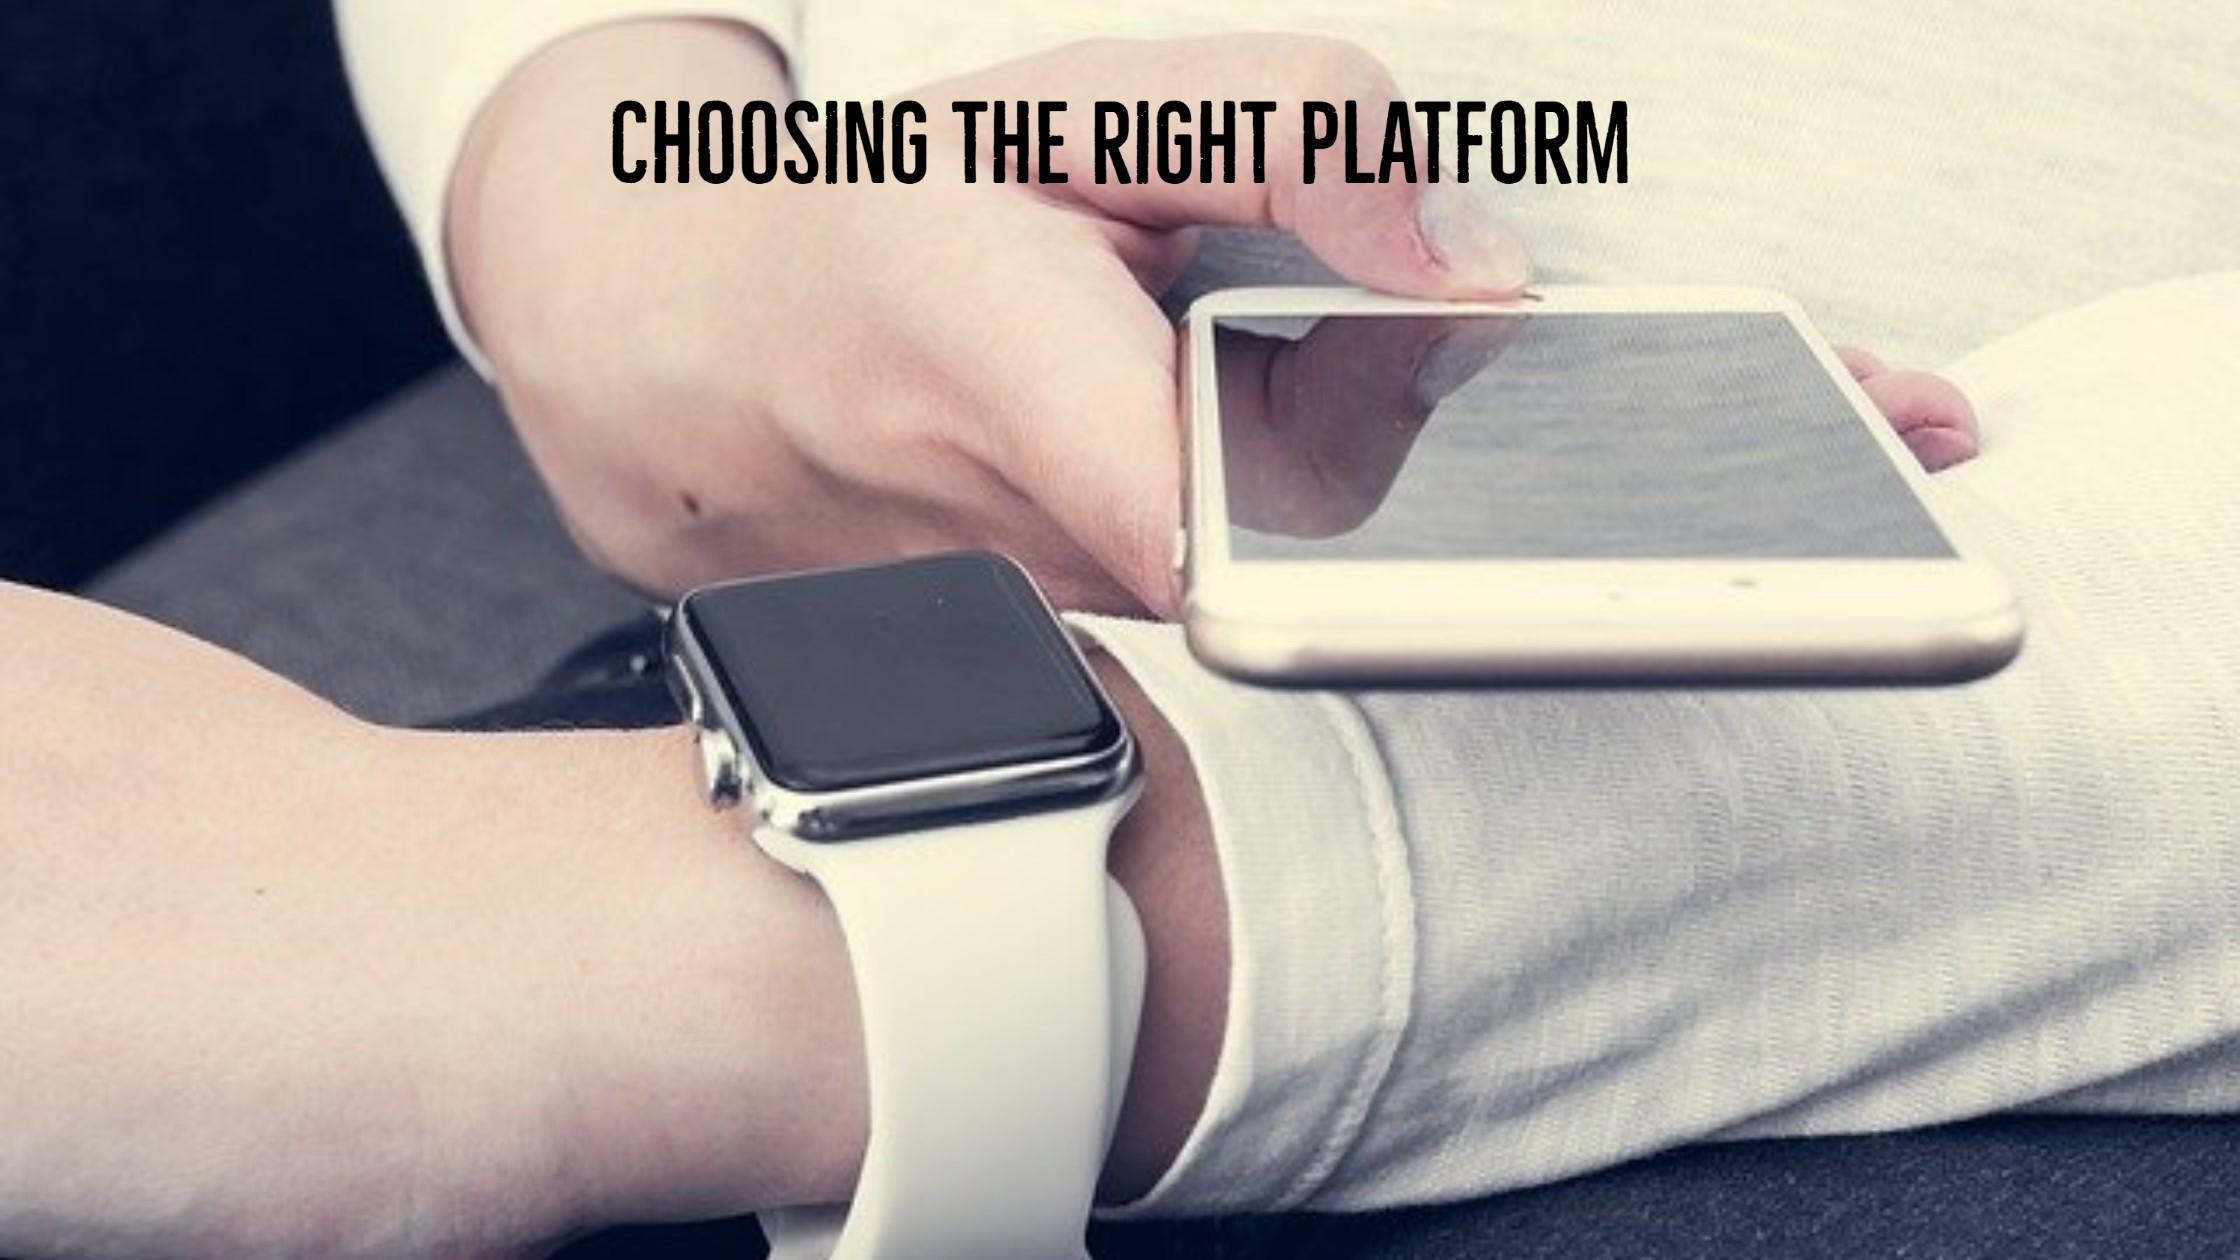 Choosing the right platform